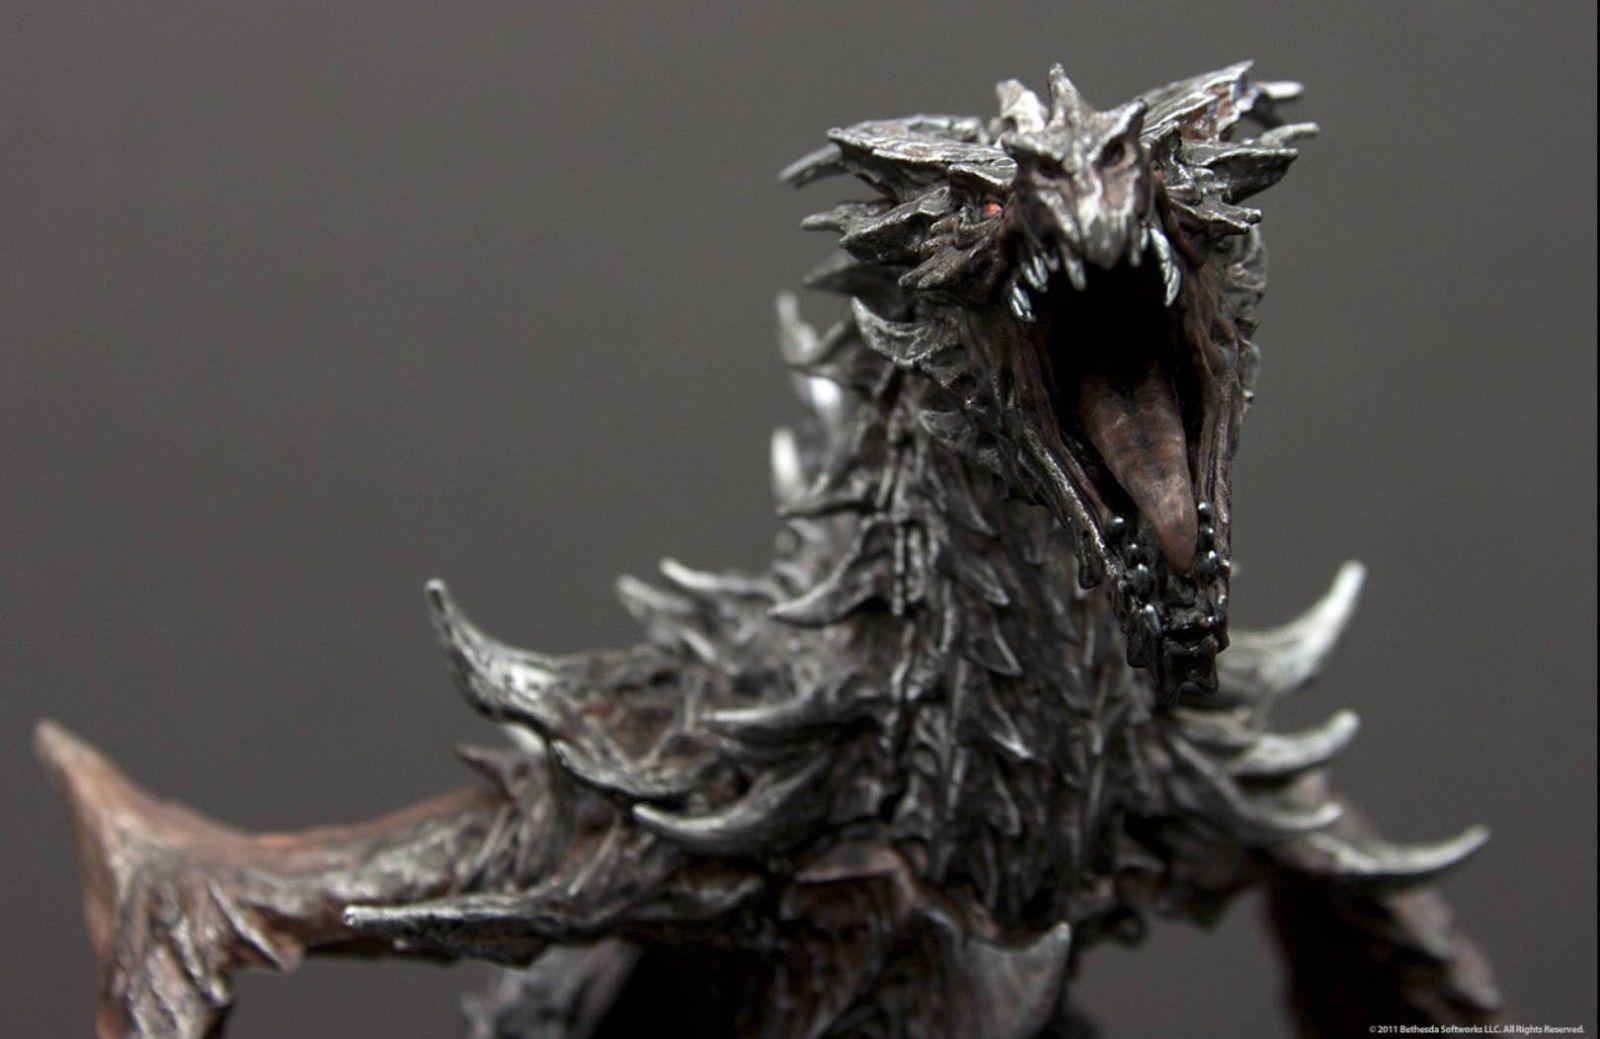 Skyrim Dragon: Elder Scrolls V: Skyrim Collectors Edition Alduin Statue